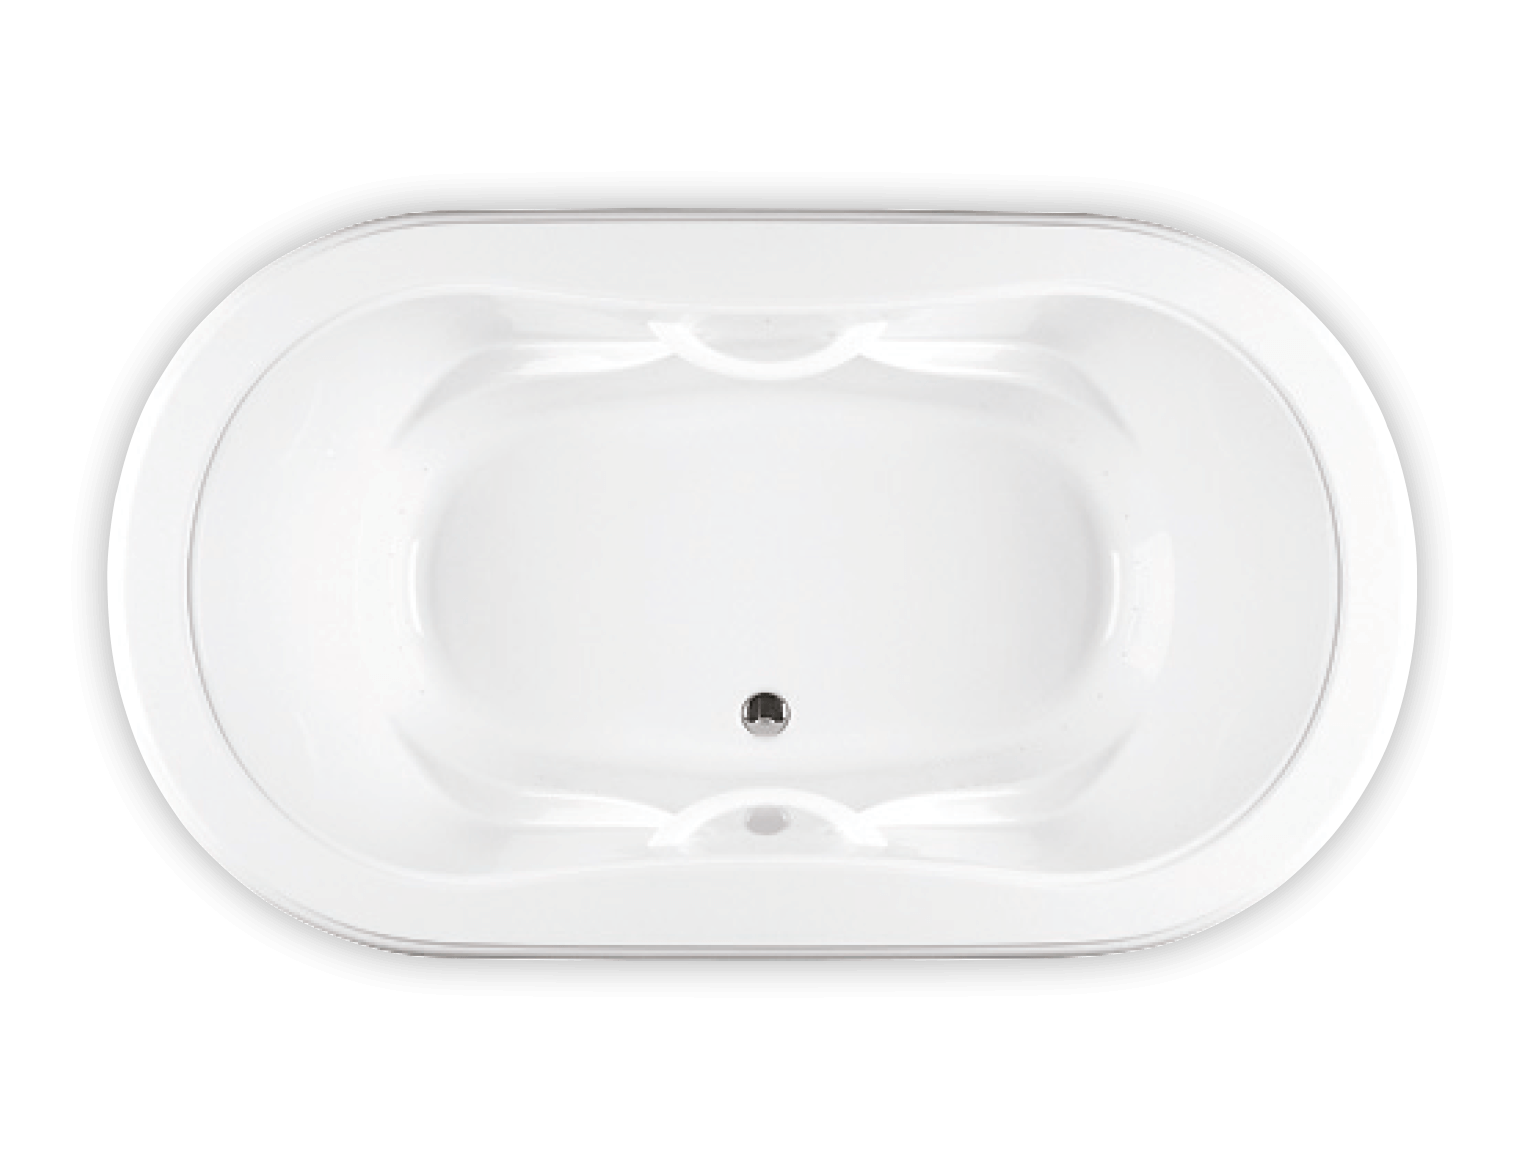 Bainultra Elegancia 6642 alcove drop-in air jet bathtub for your Victorian bathroom